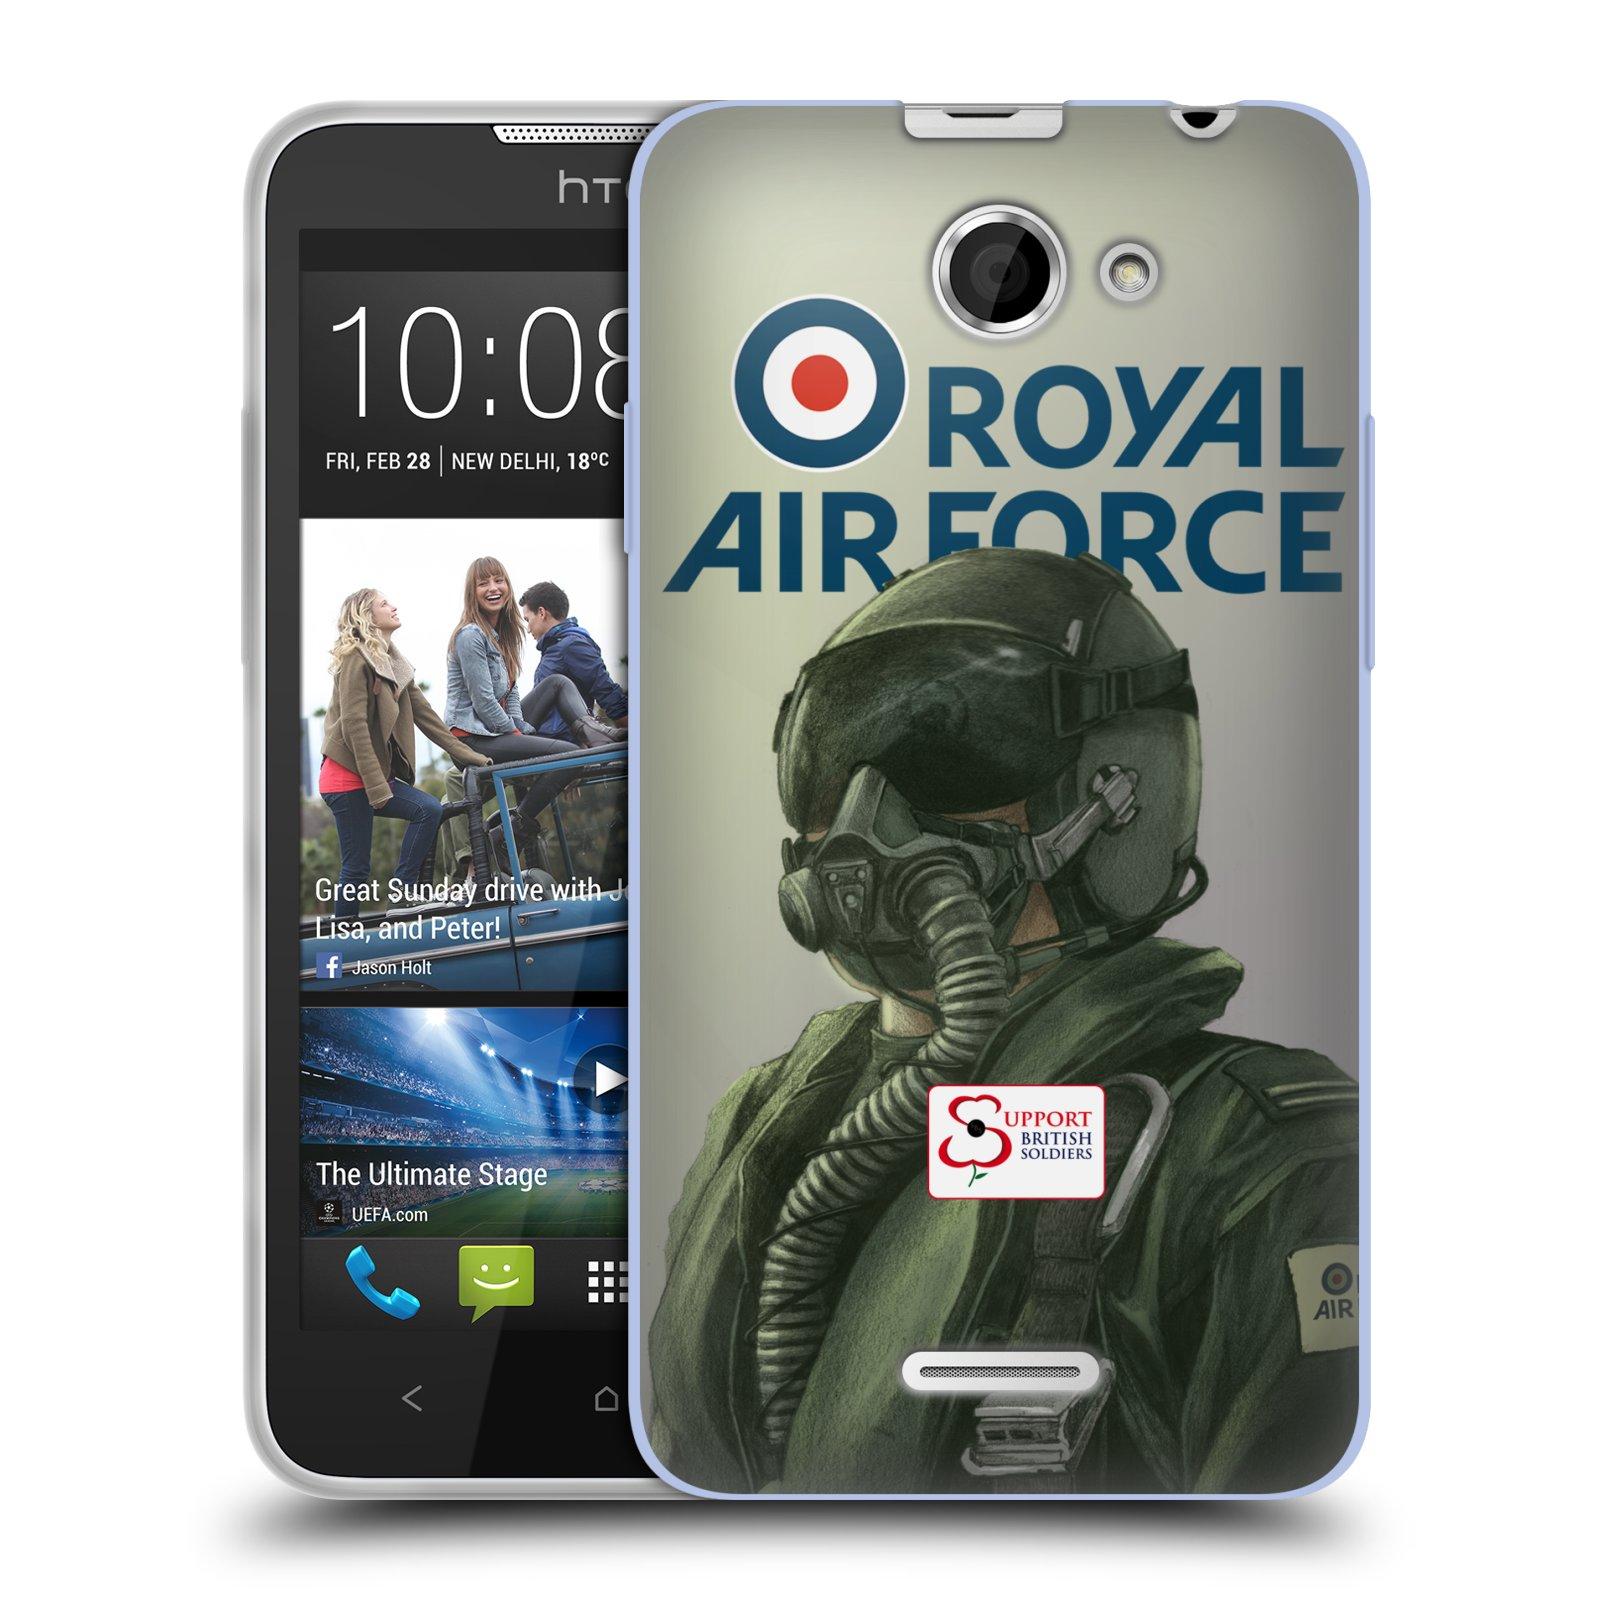 Silikonové pouzdro na mobil HTC Desire 516 HEAD CASE Royal Air Force (Silikonový kryt či obal na mobilní telefon HTC Desire 516 Dual SIM)